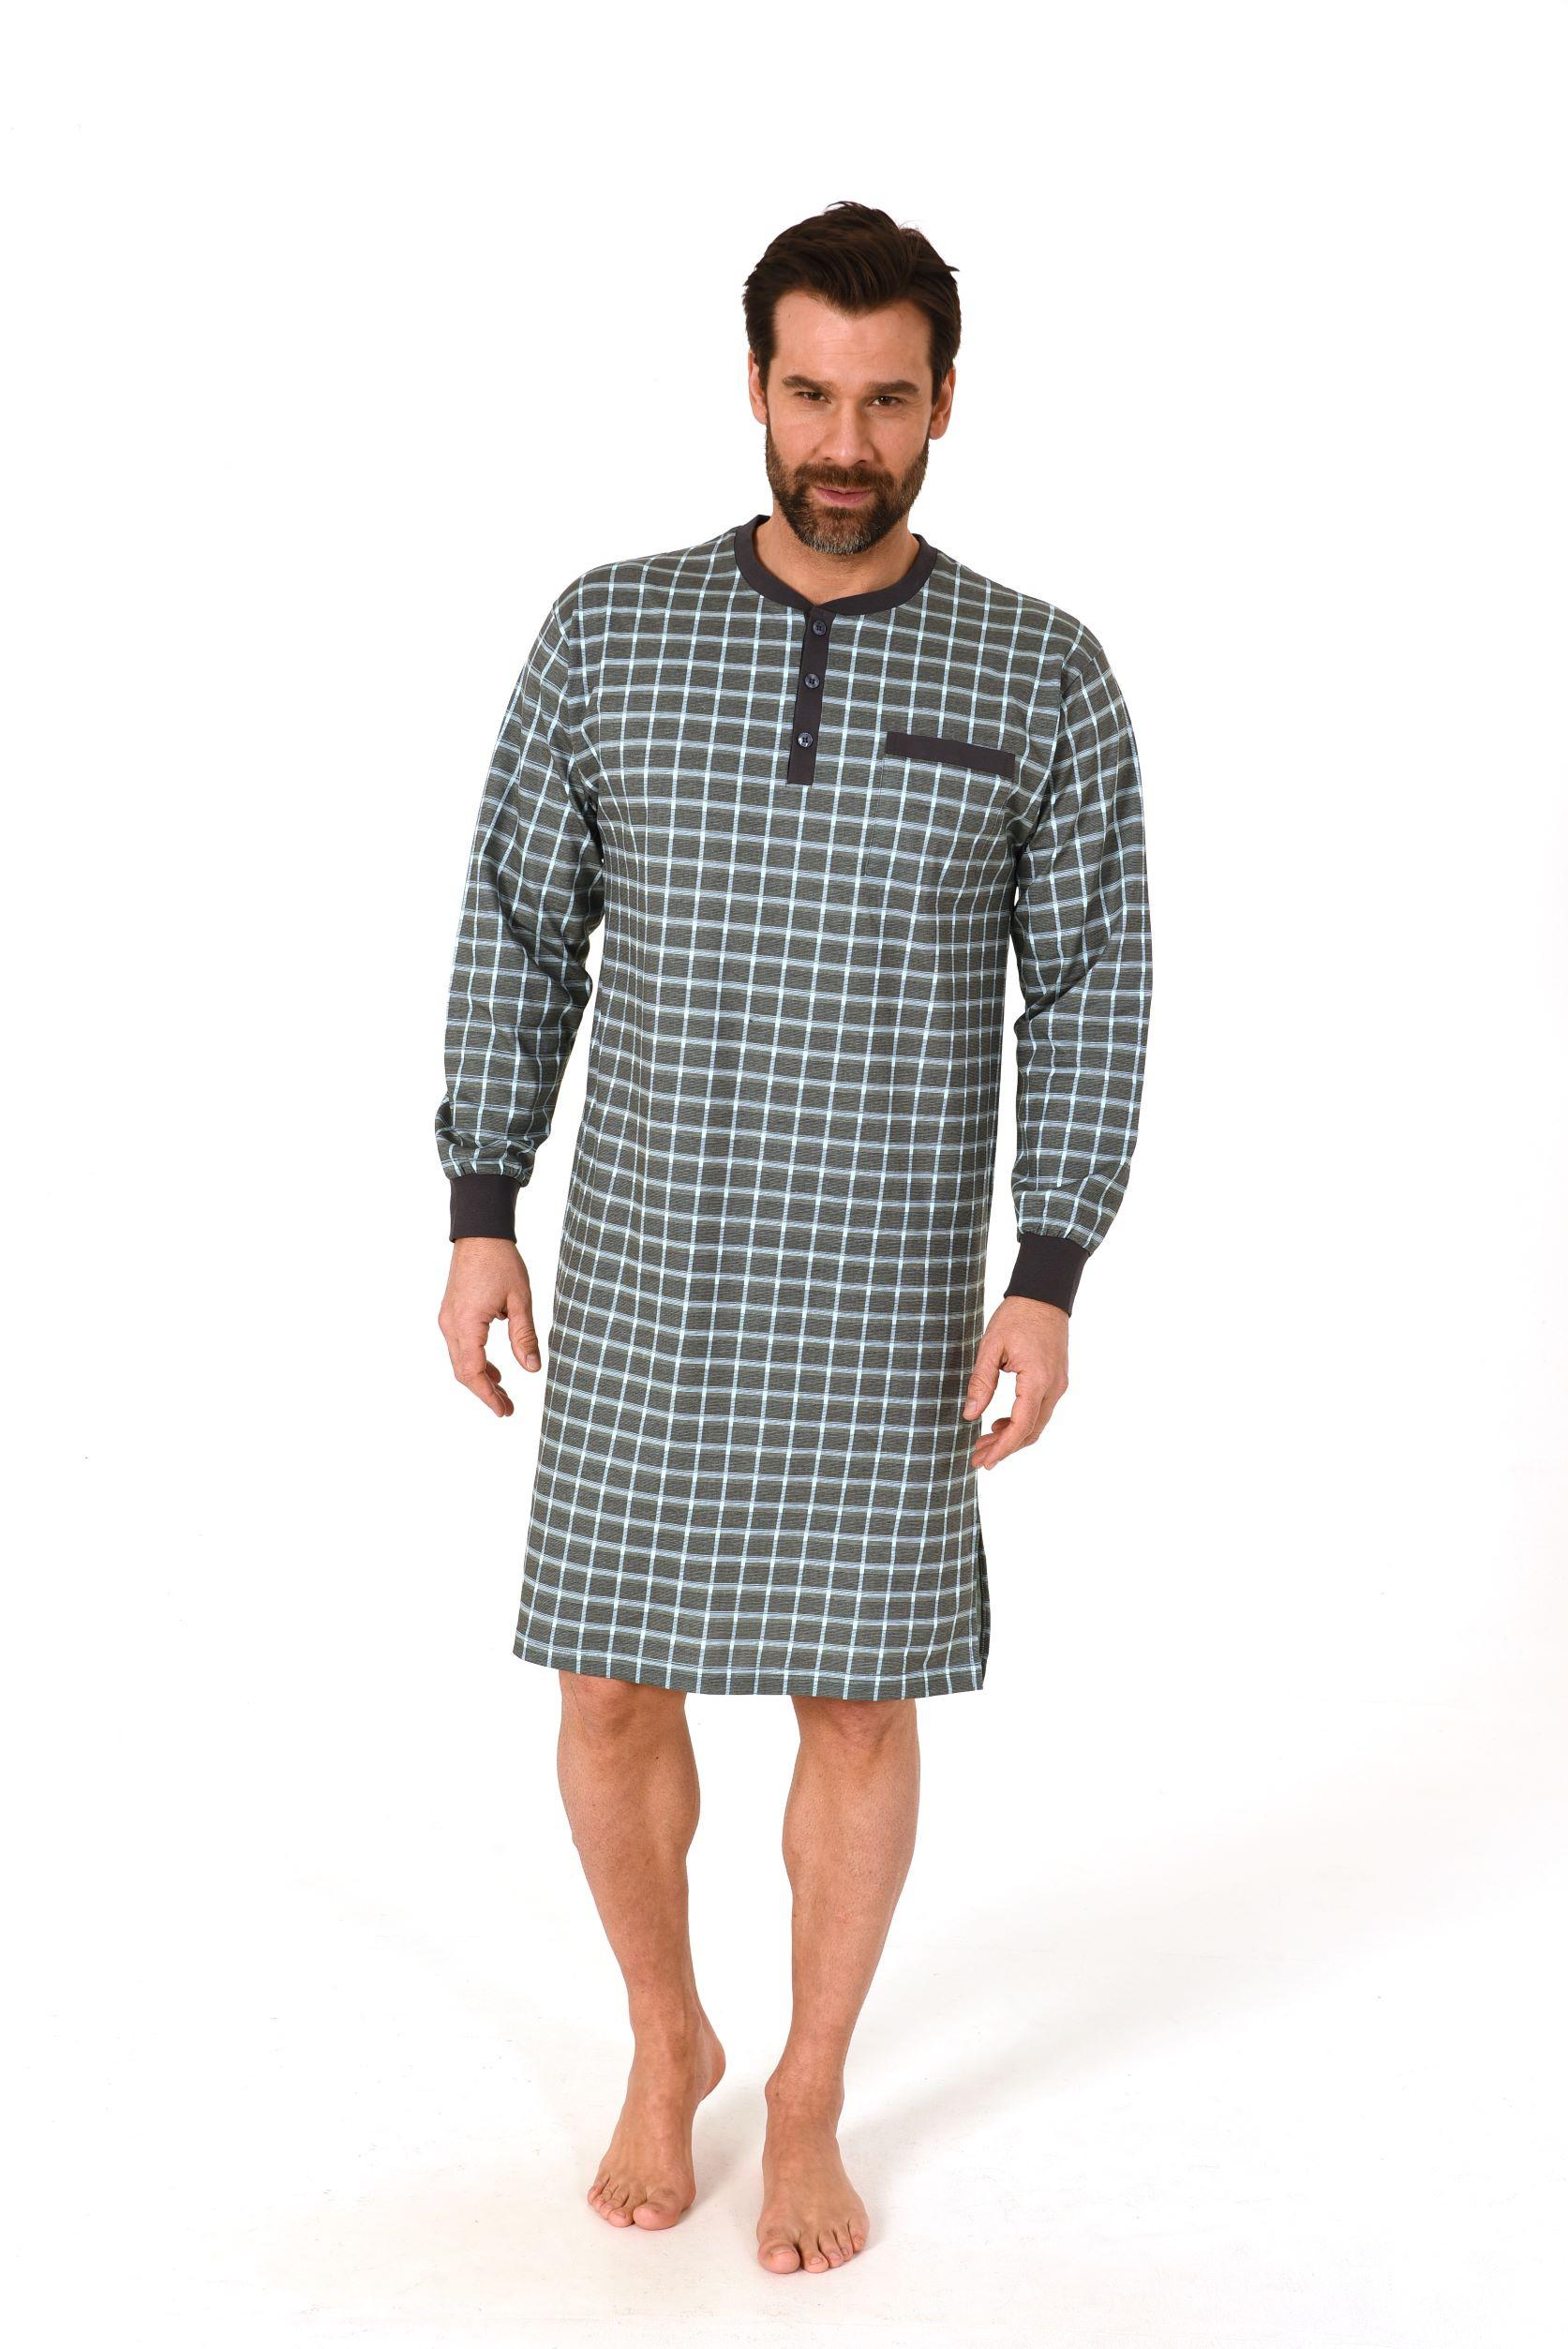 Norman heren nachthemd 110 90 502-56-58-Blauw